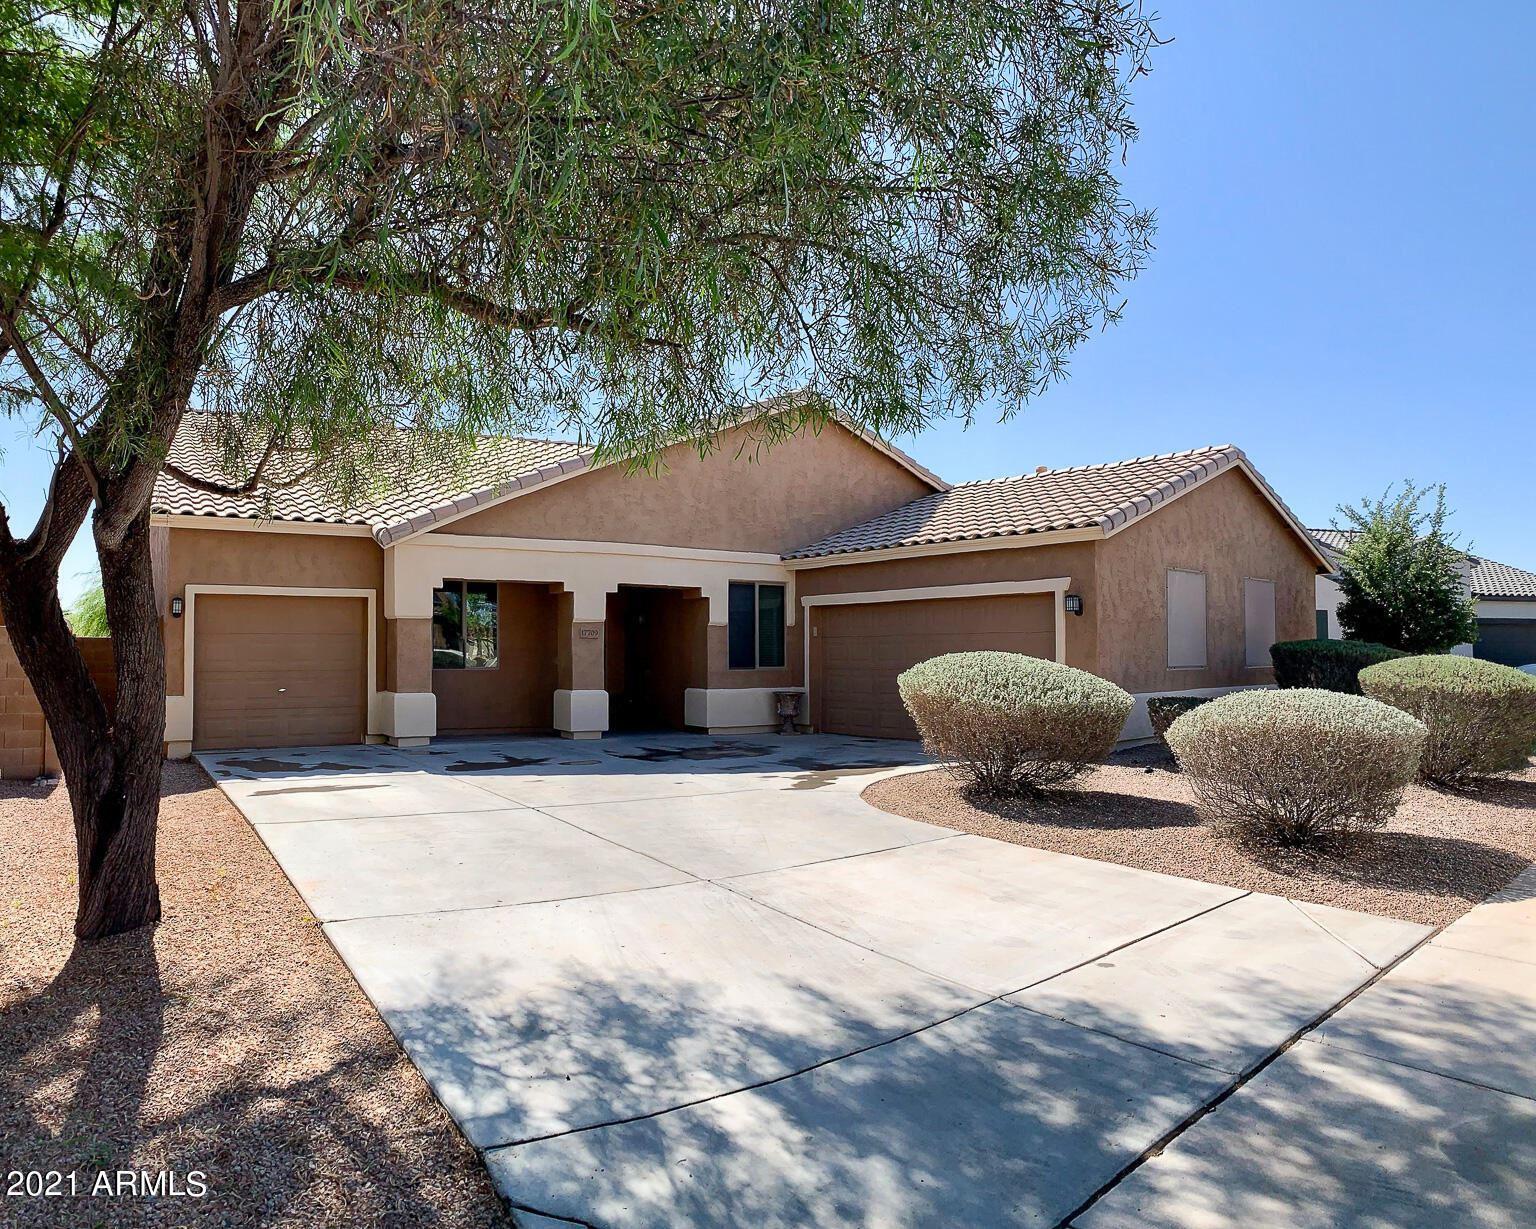 Photo for 17709 N MILLER Way, Maricopa, AZ 85139 (MLS # 6245877)